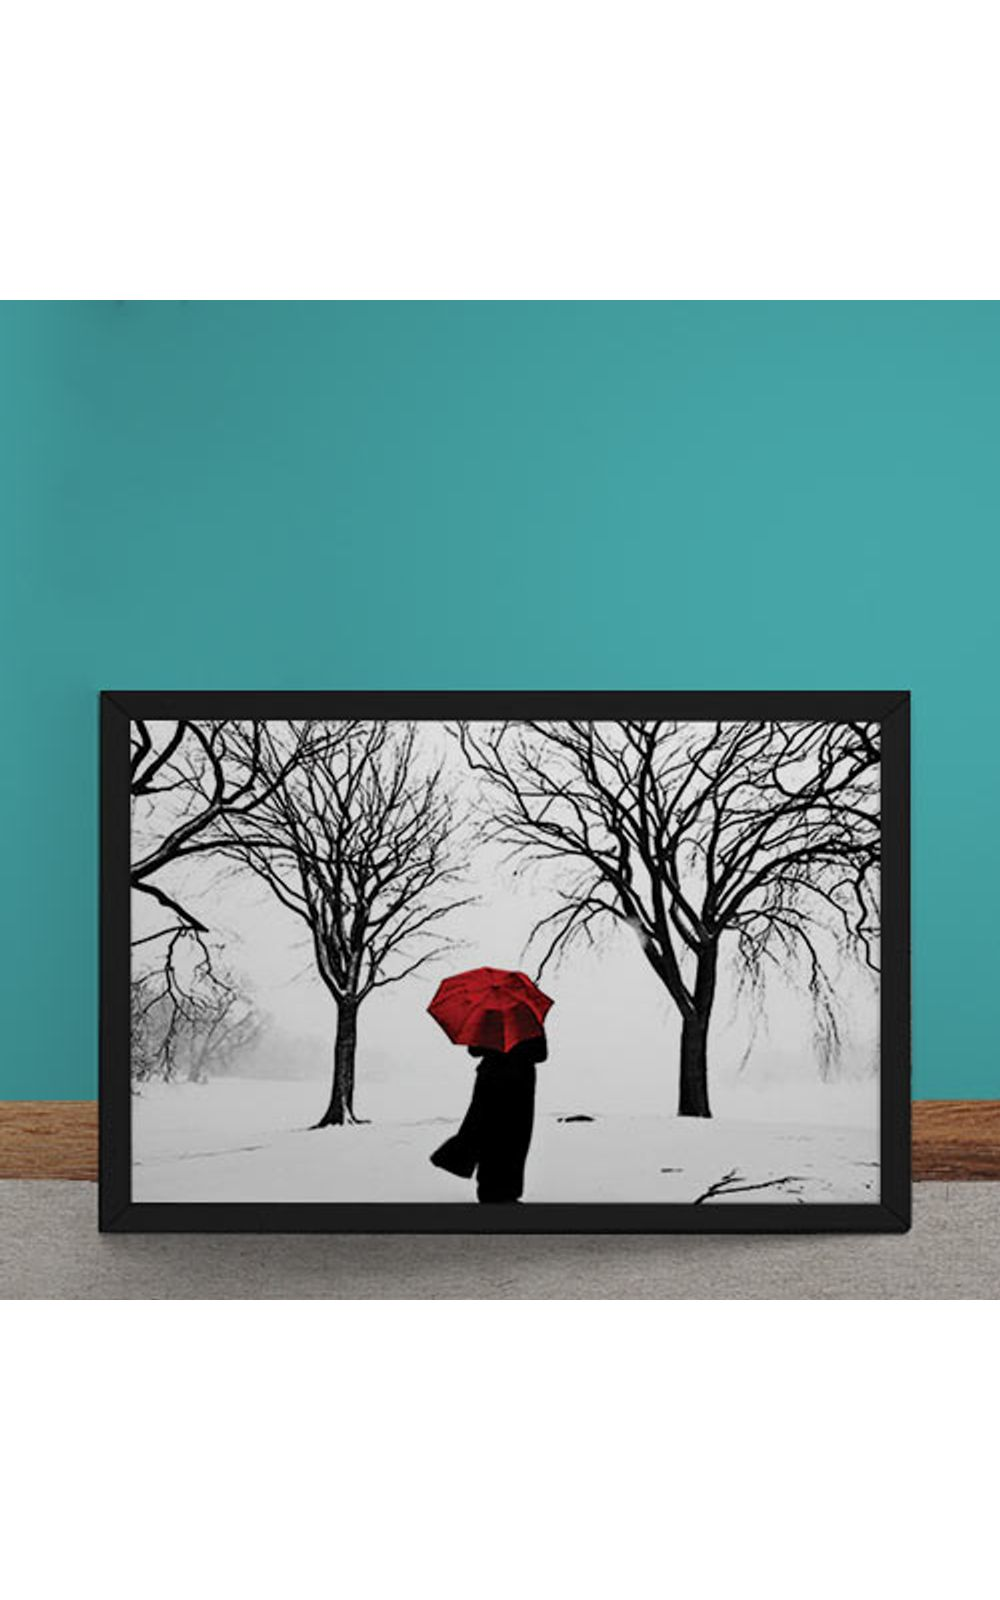 Foto 1 - Quadro Decorativo Guarda Chuva Vermelho na Neve